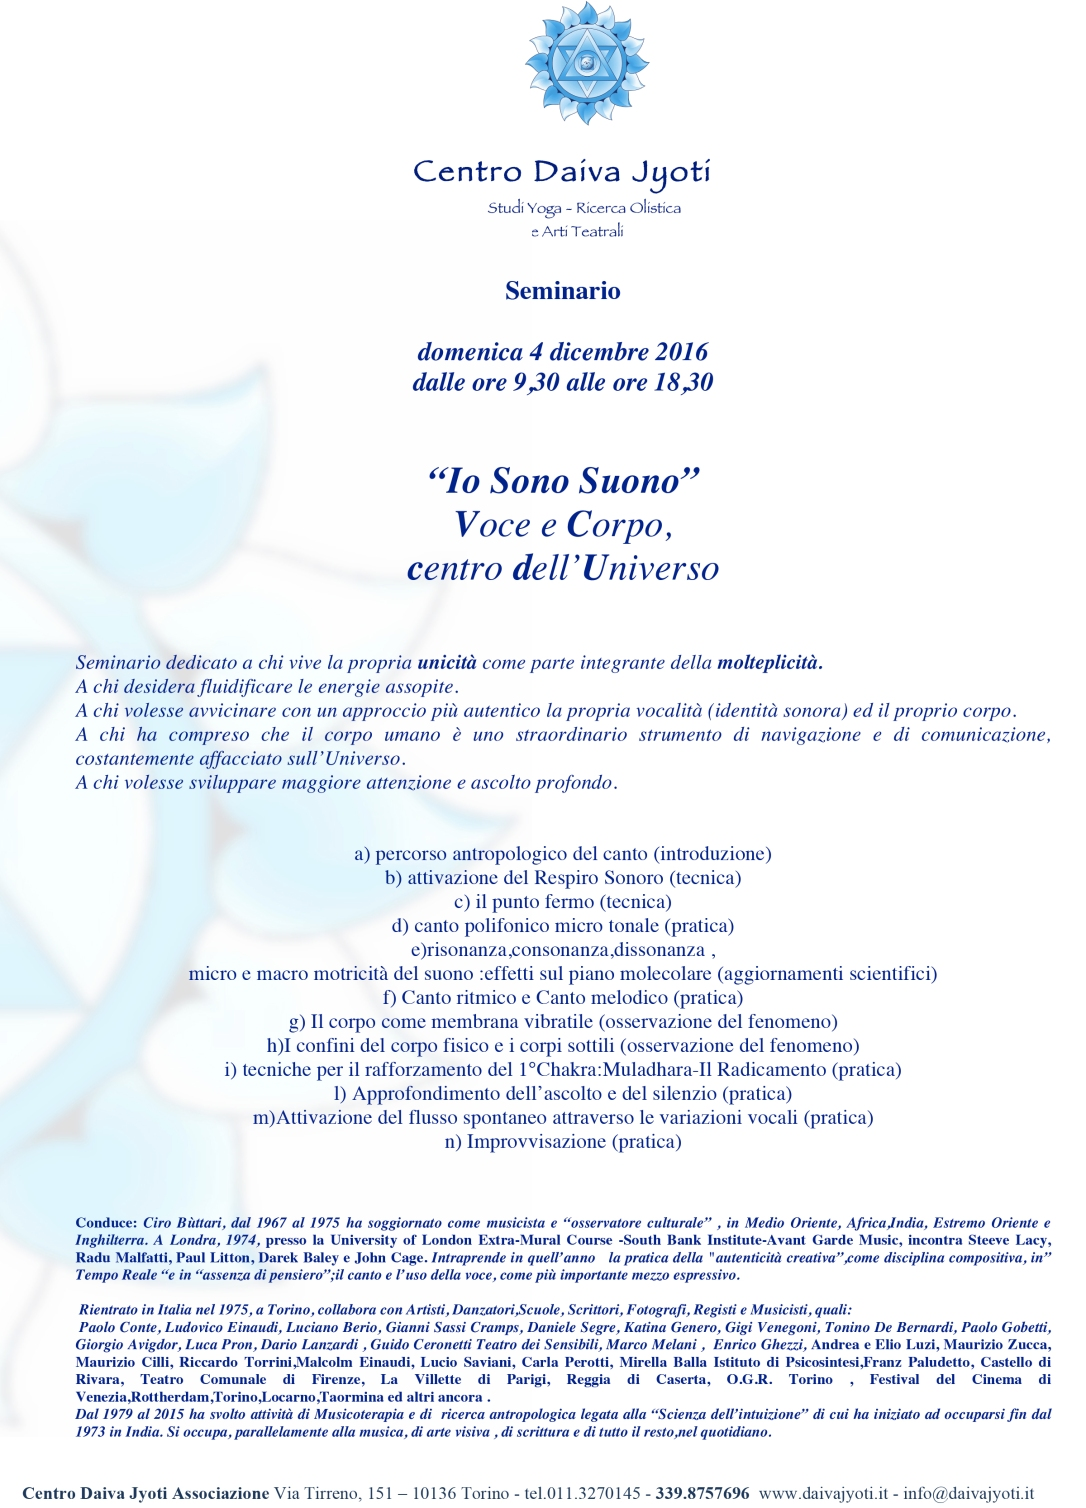 SEMINARIO SUONO - CIRO BUTTARI 4 DIC 2016.jpg